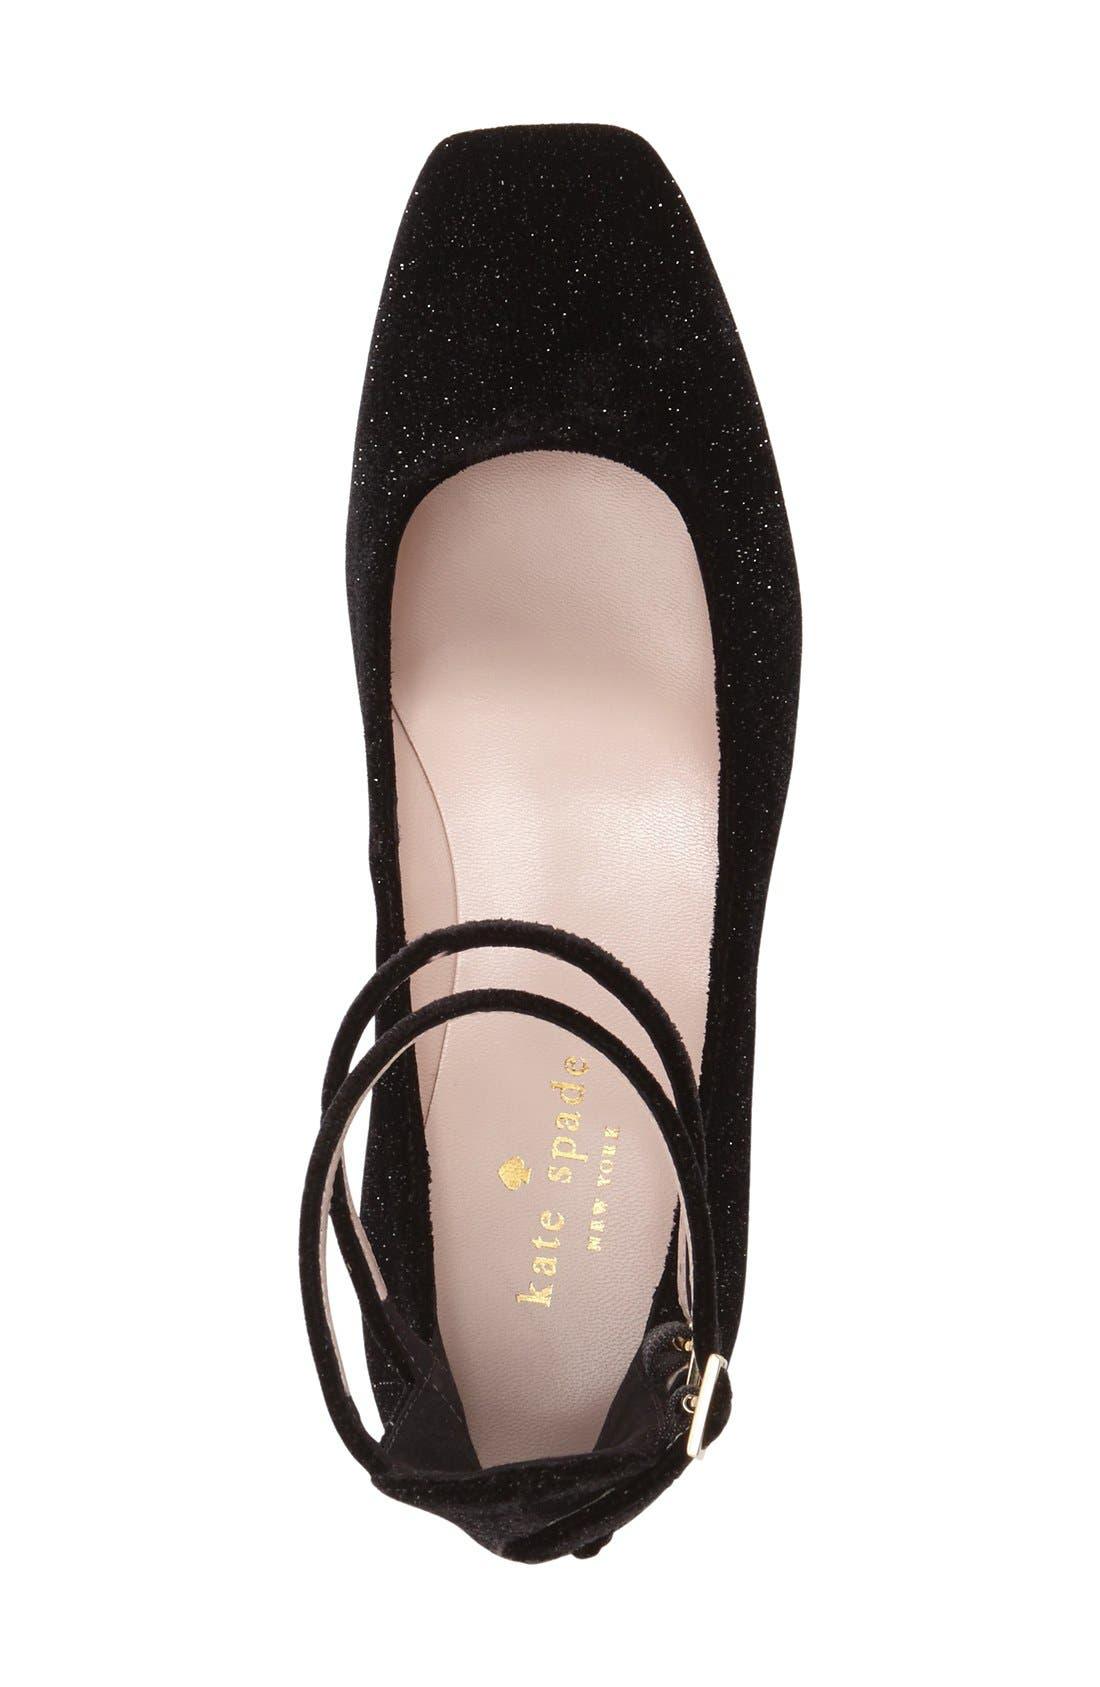 Alternate Image 3  - kate spade new york 'marcellina' ankle strap pump (Women)